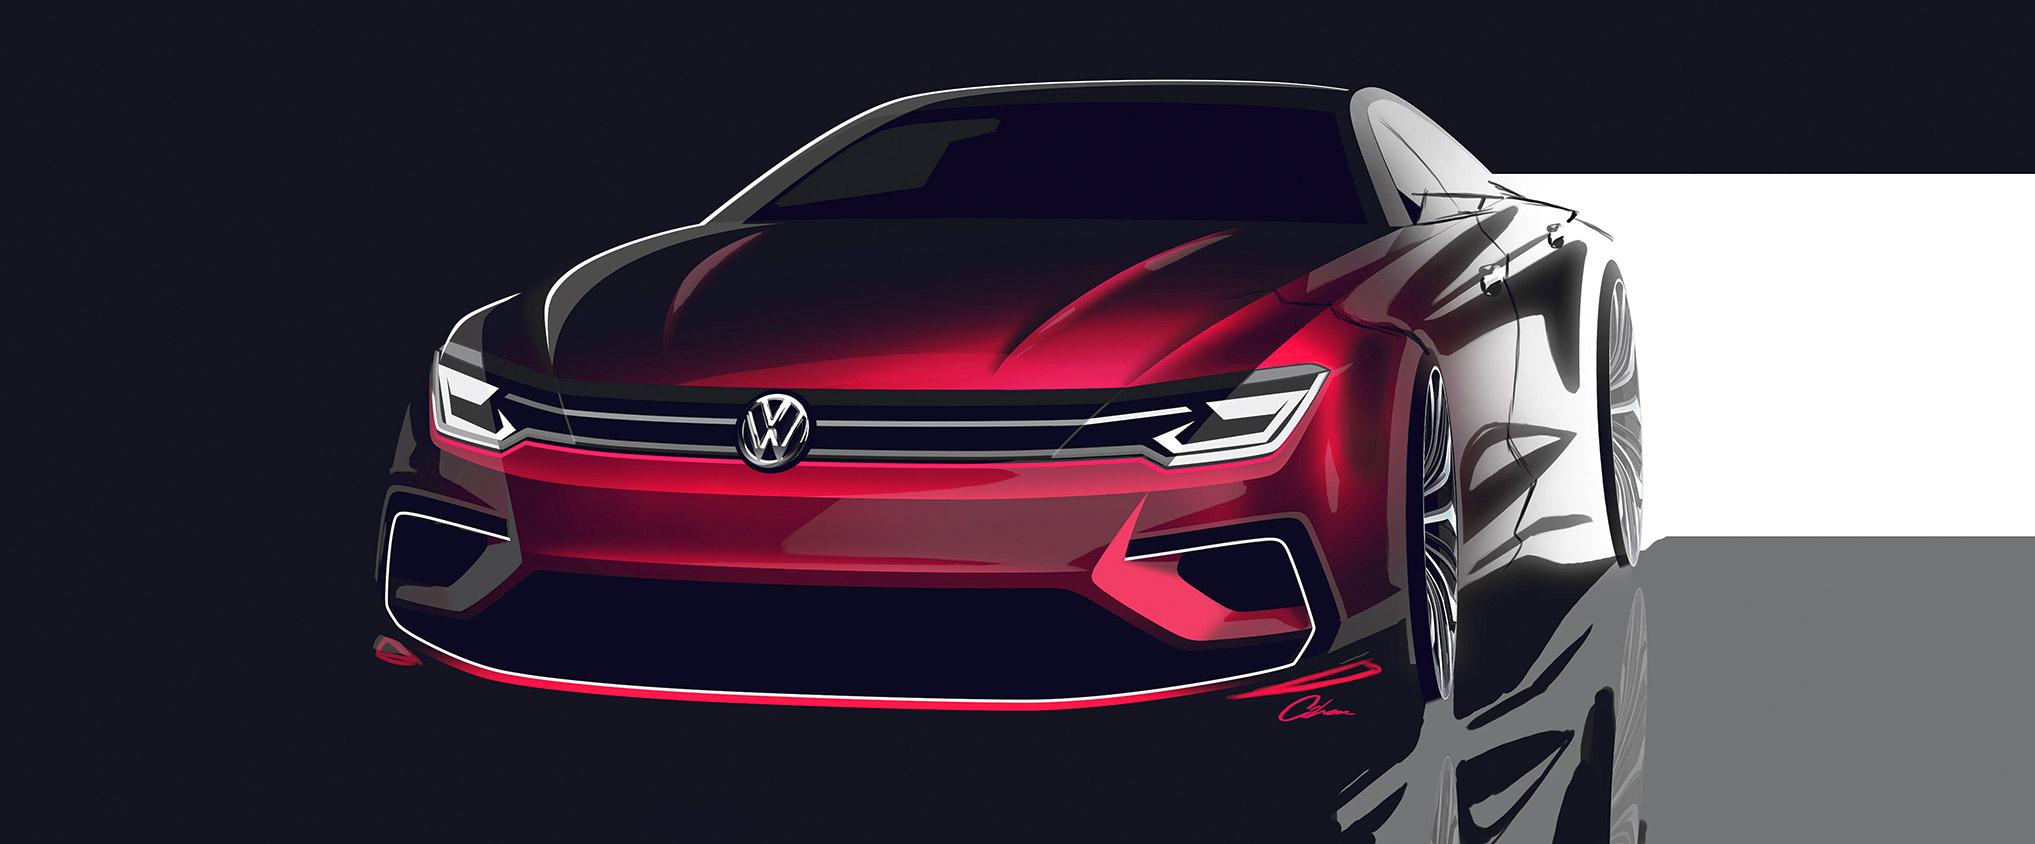 volkswagen-midsize-coupe-concept-1